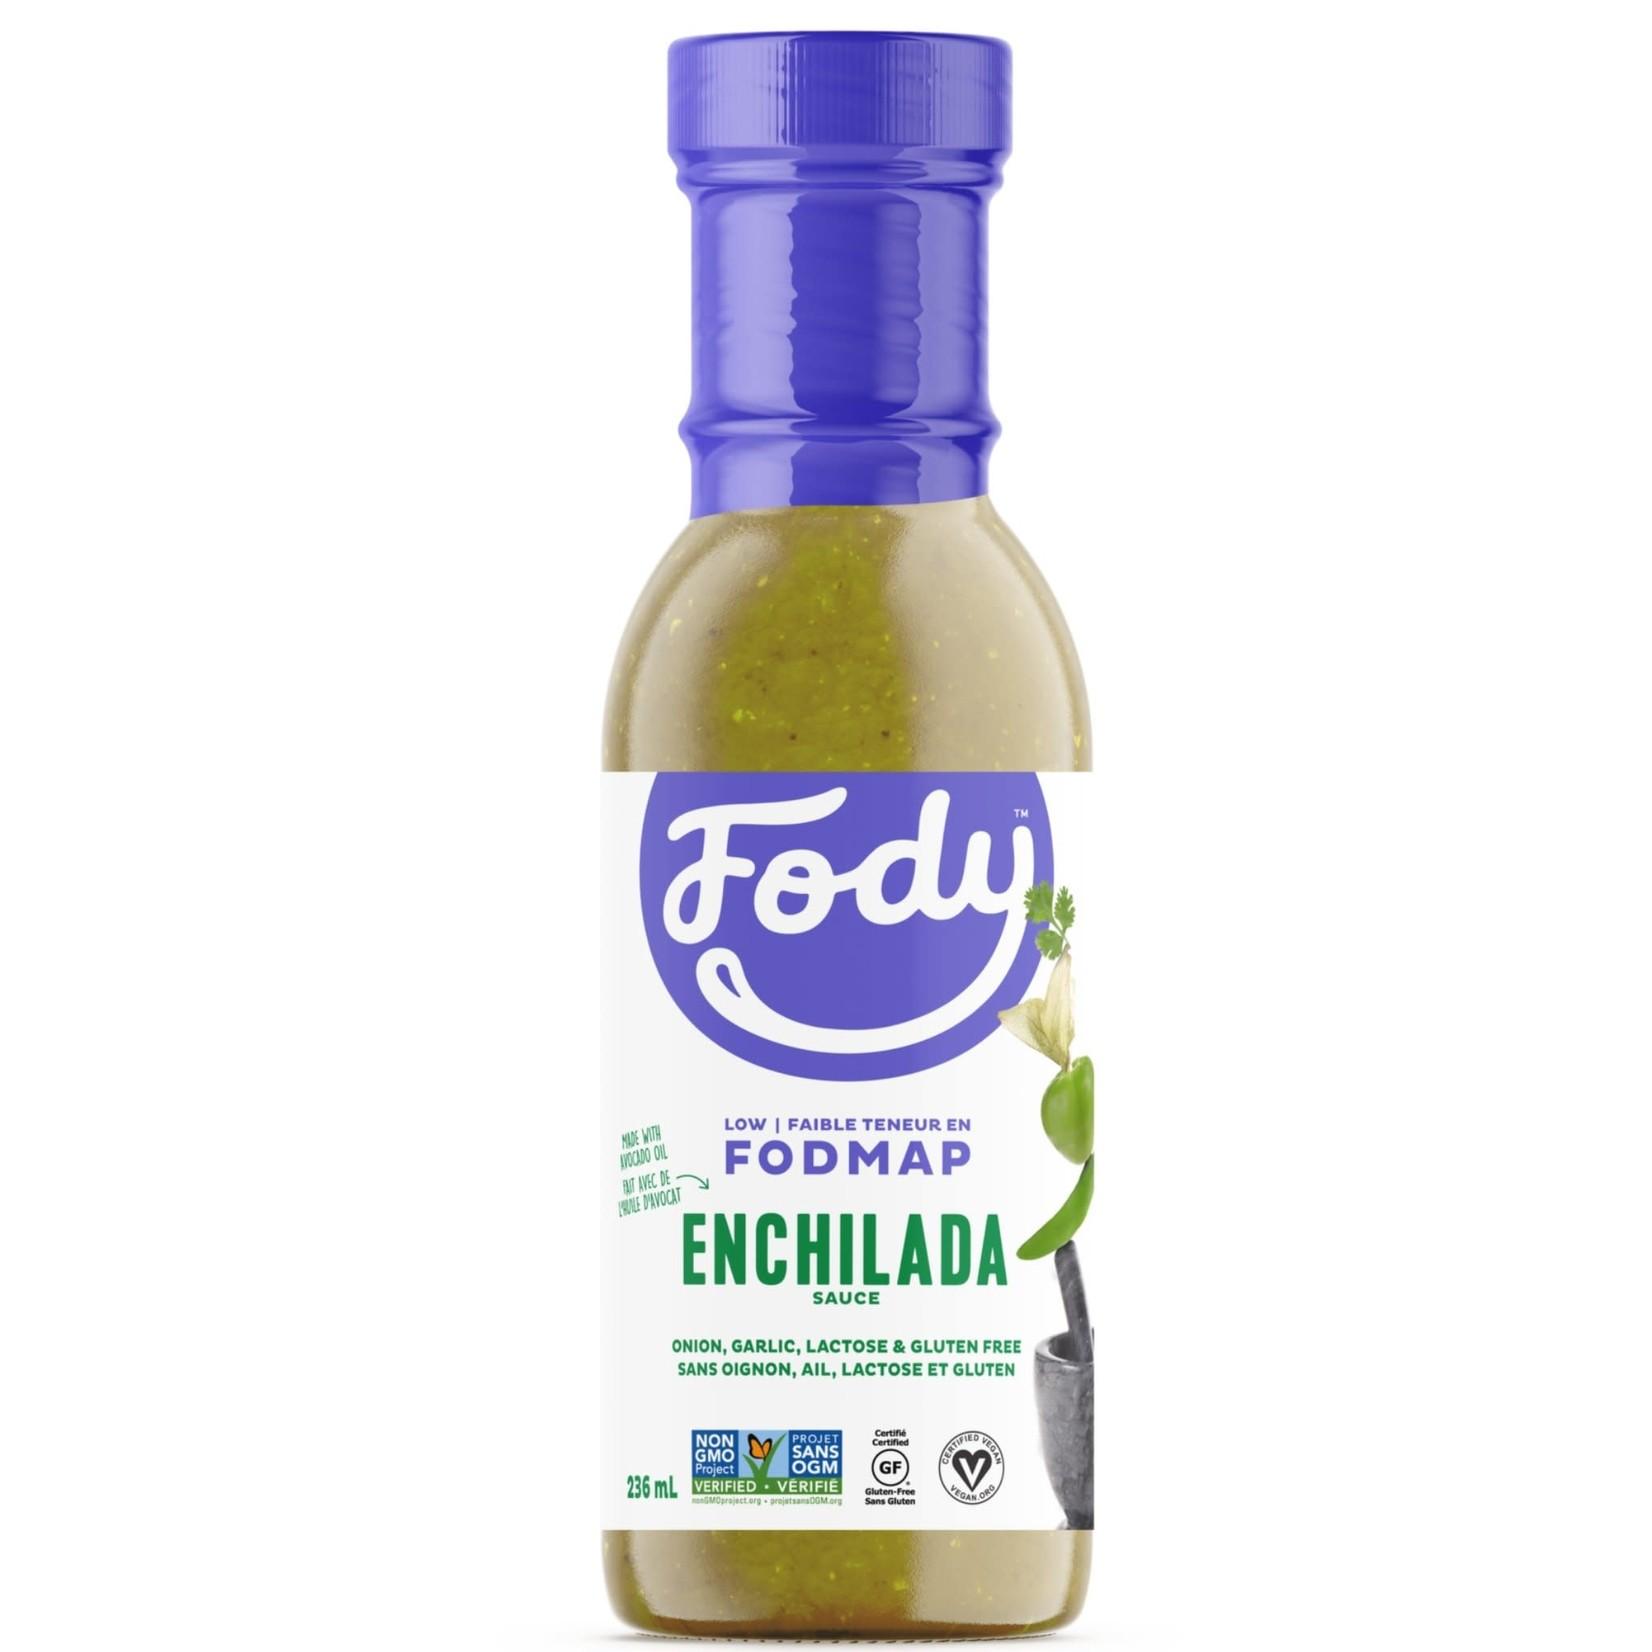 Fody Food Co. Fody Enchilada Sauce 236ml